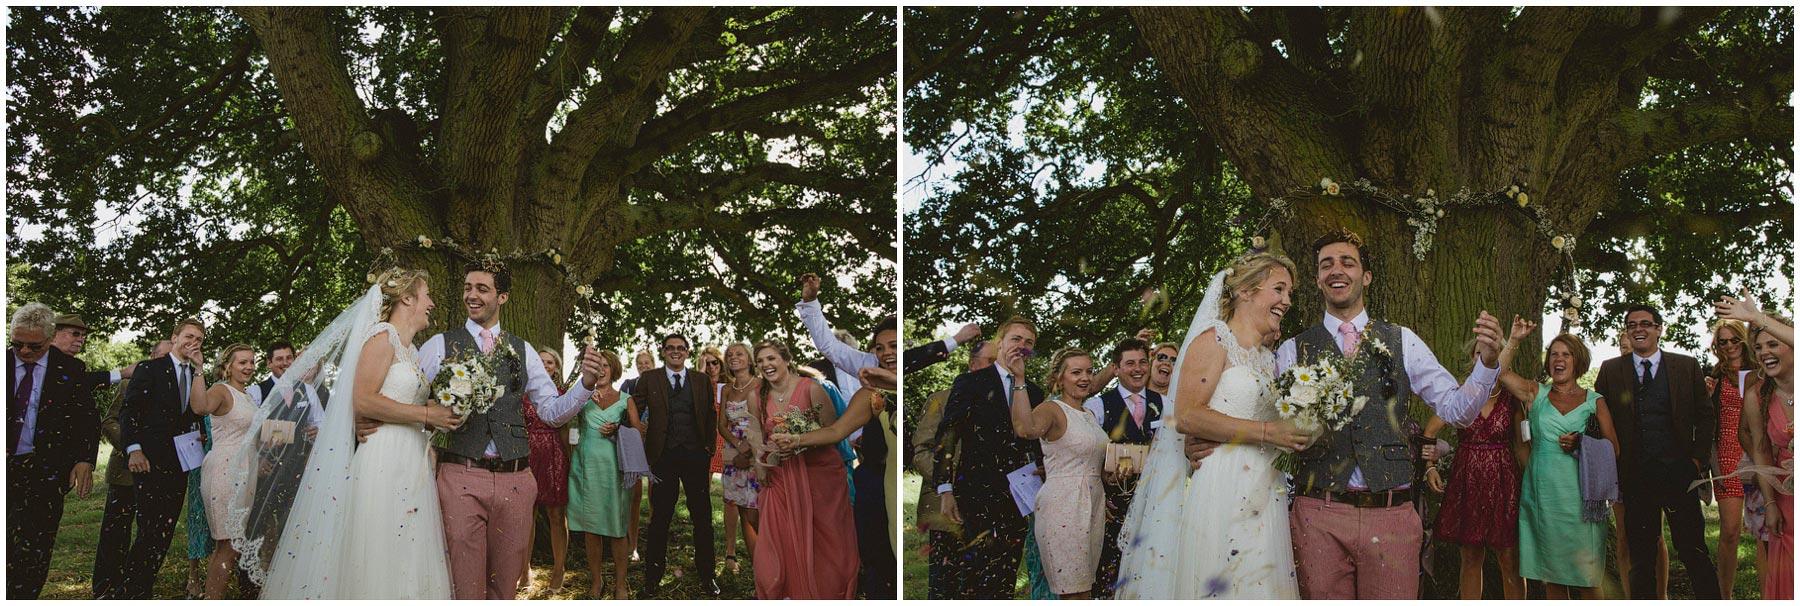 Kent-Festival-Tipi-wedding-photography_0086